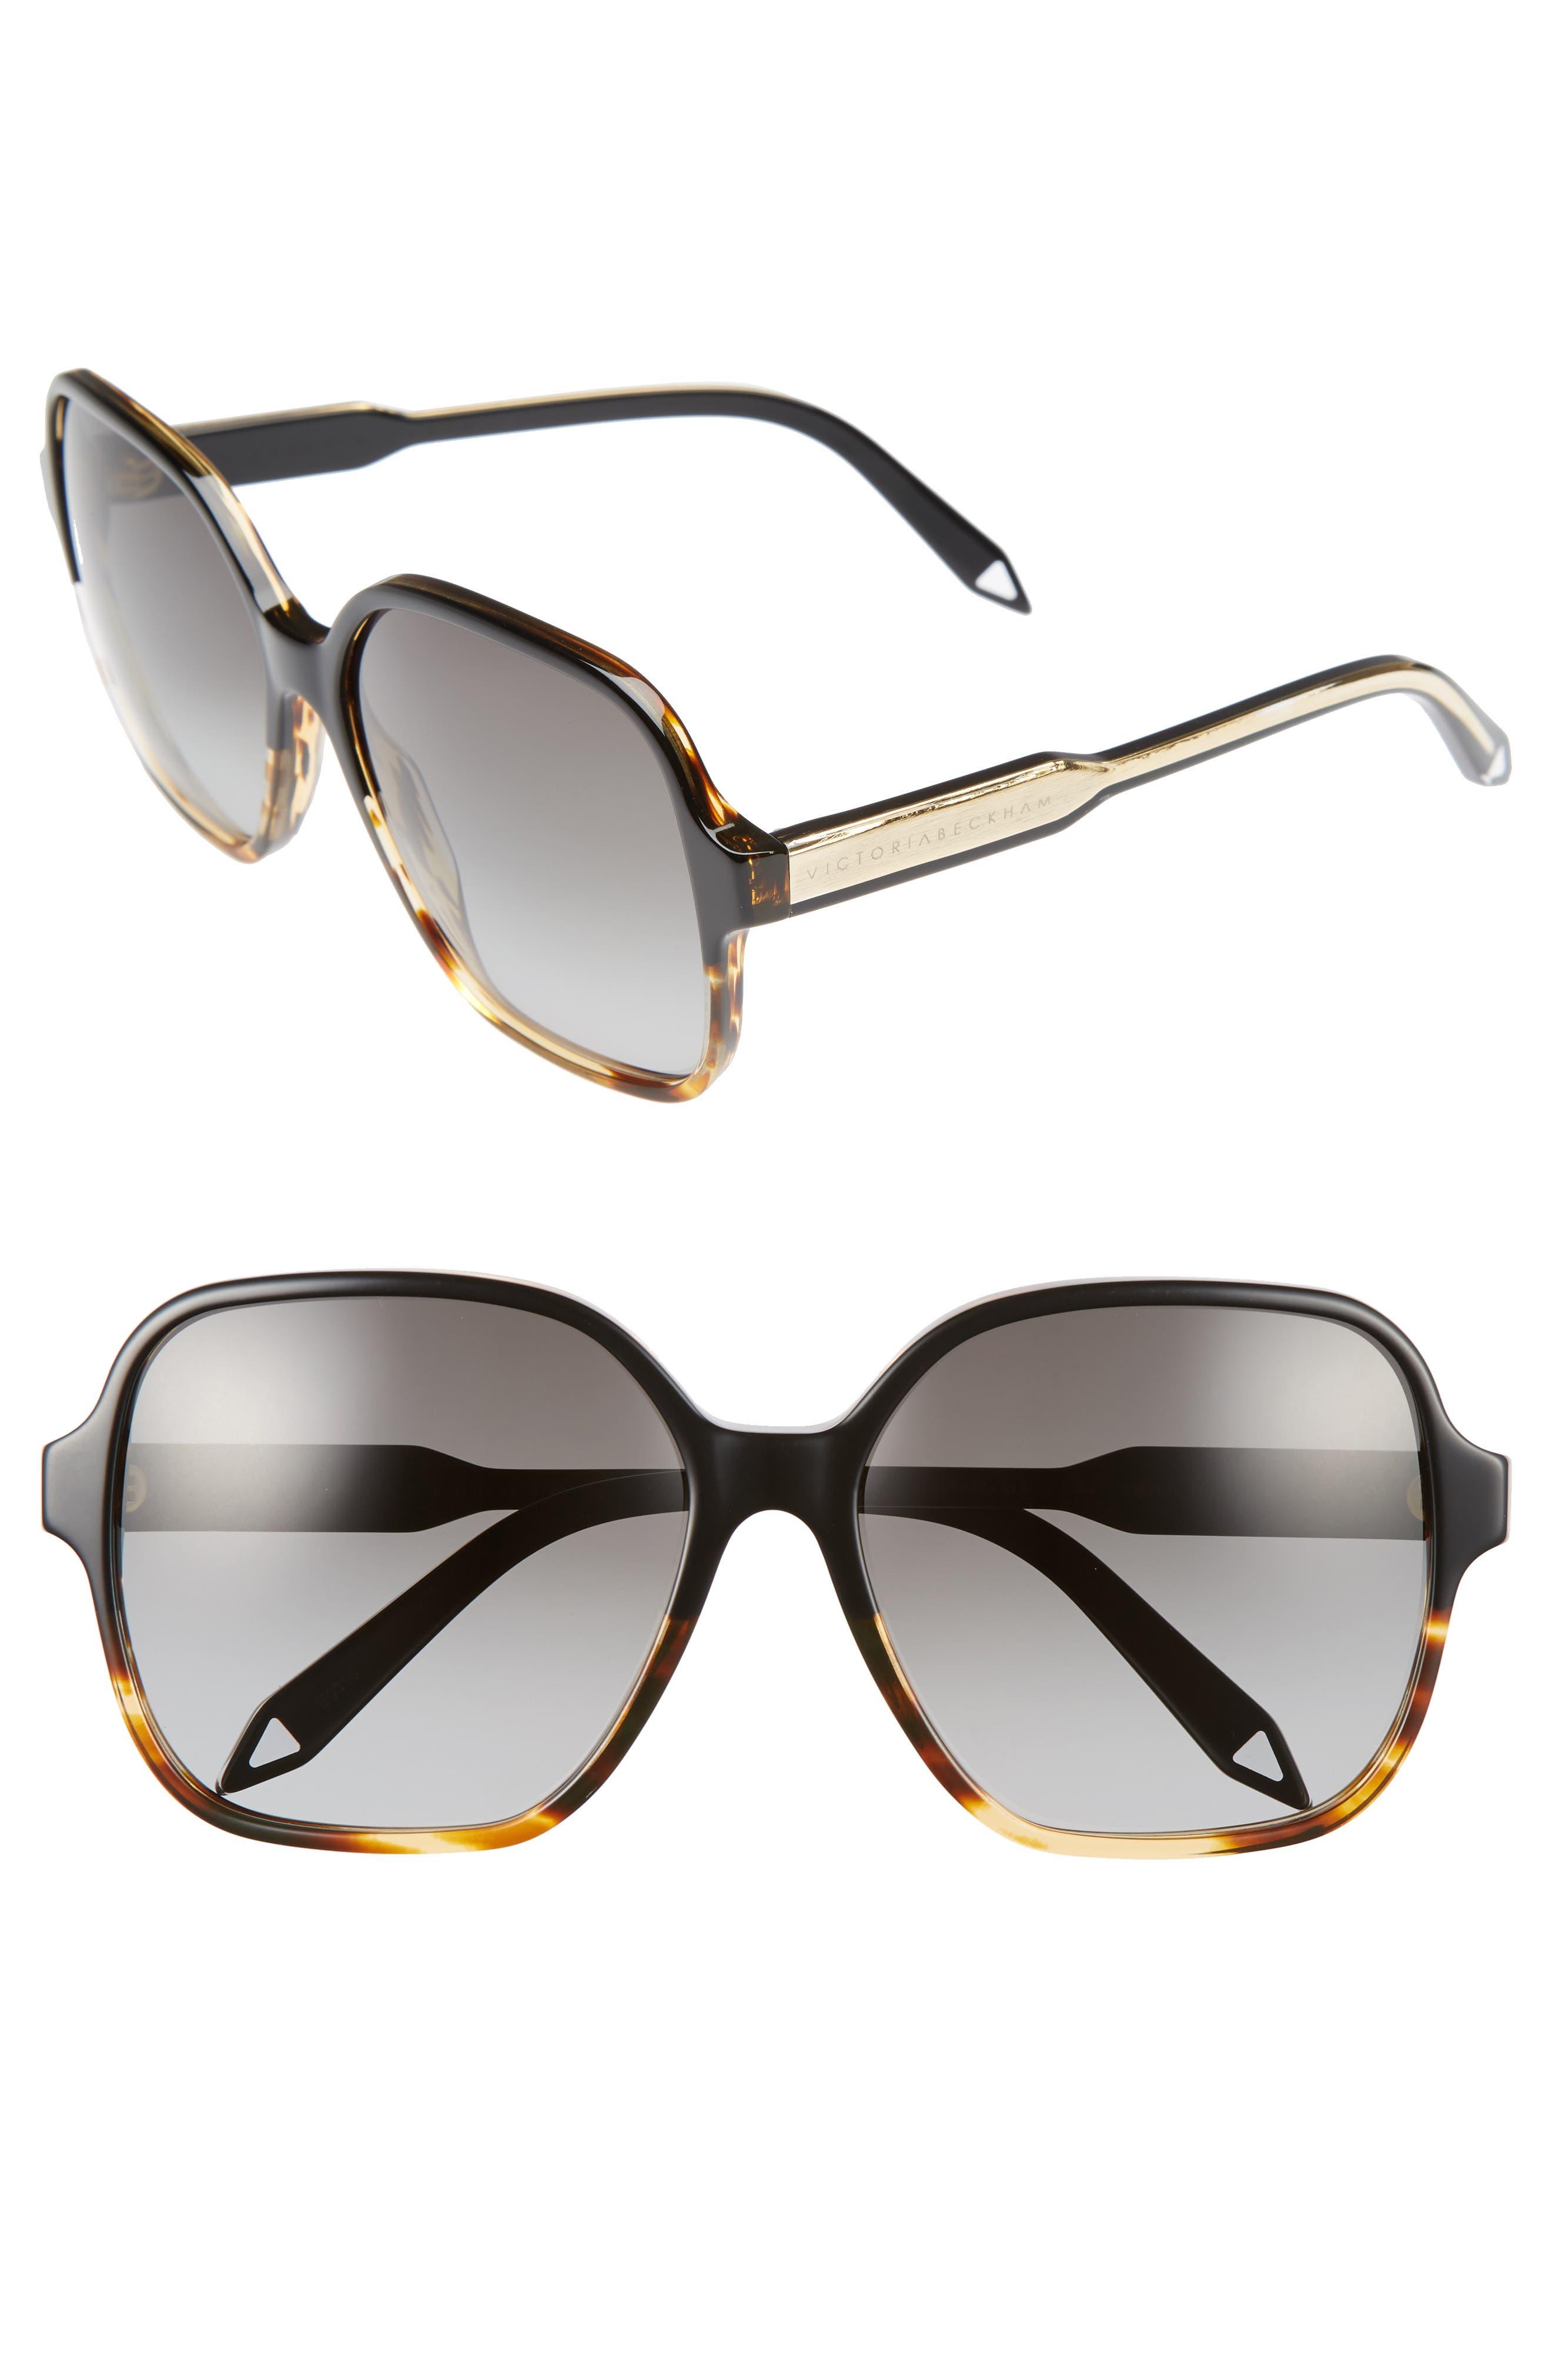 Main Image - Victoria Beckham Iconic Square 59mm Sunglasses